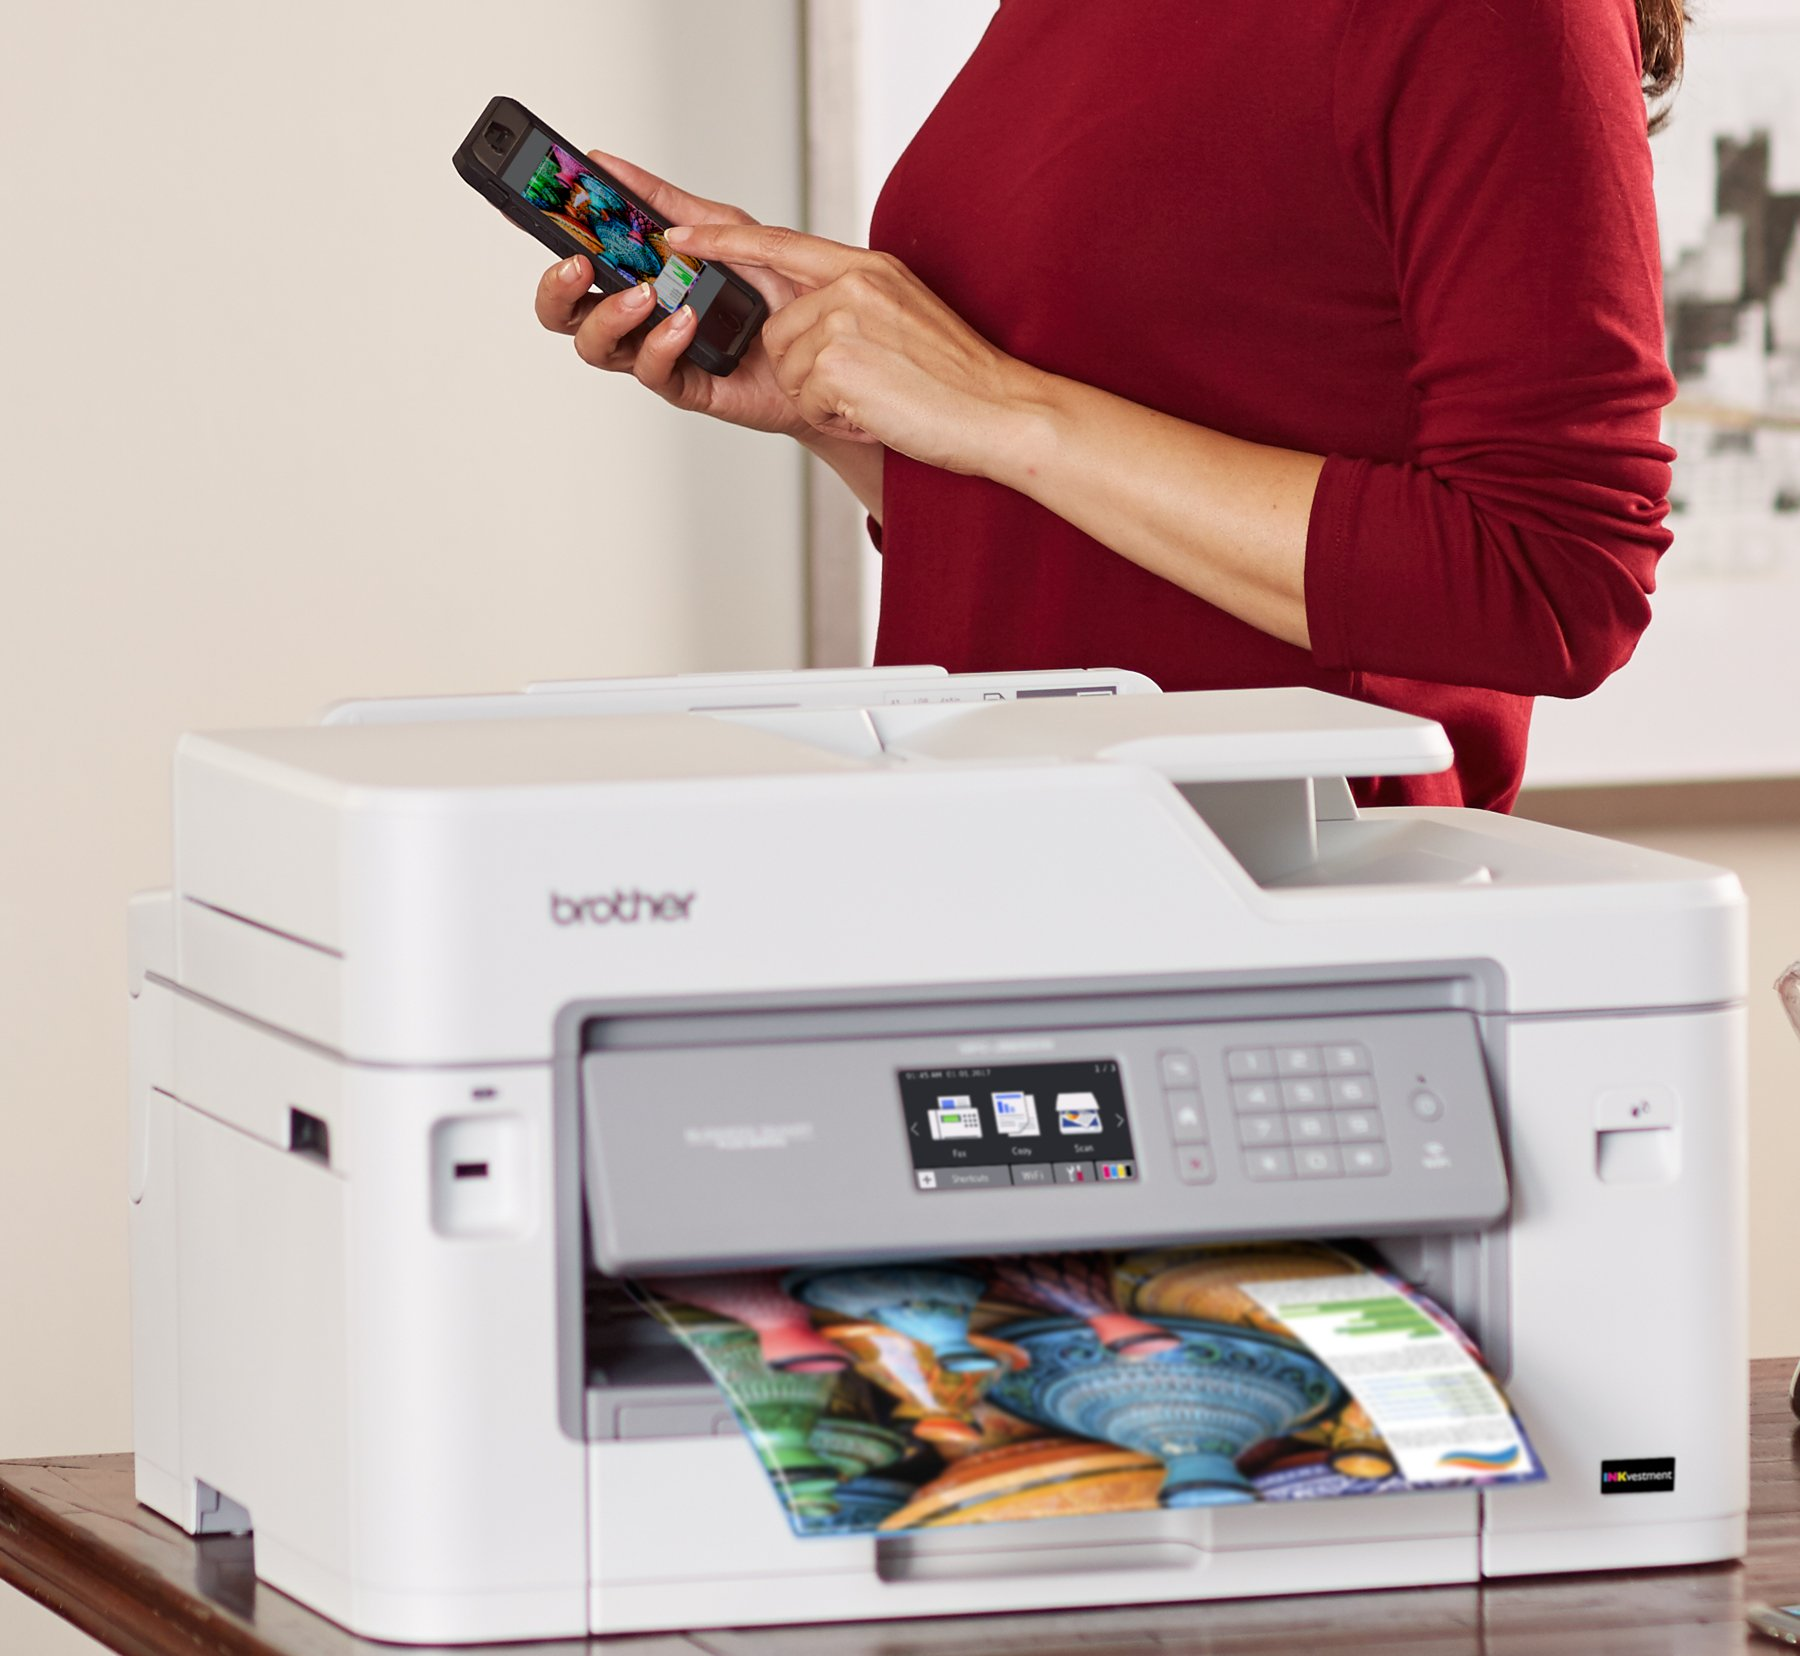 8 Best Laser And Inkjet Printers For Envelopes in 2019